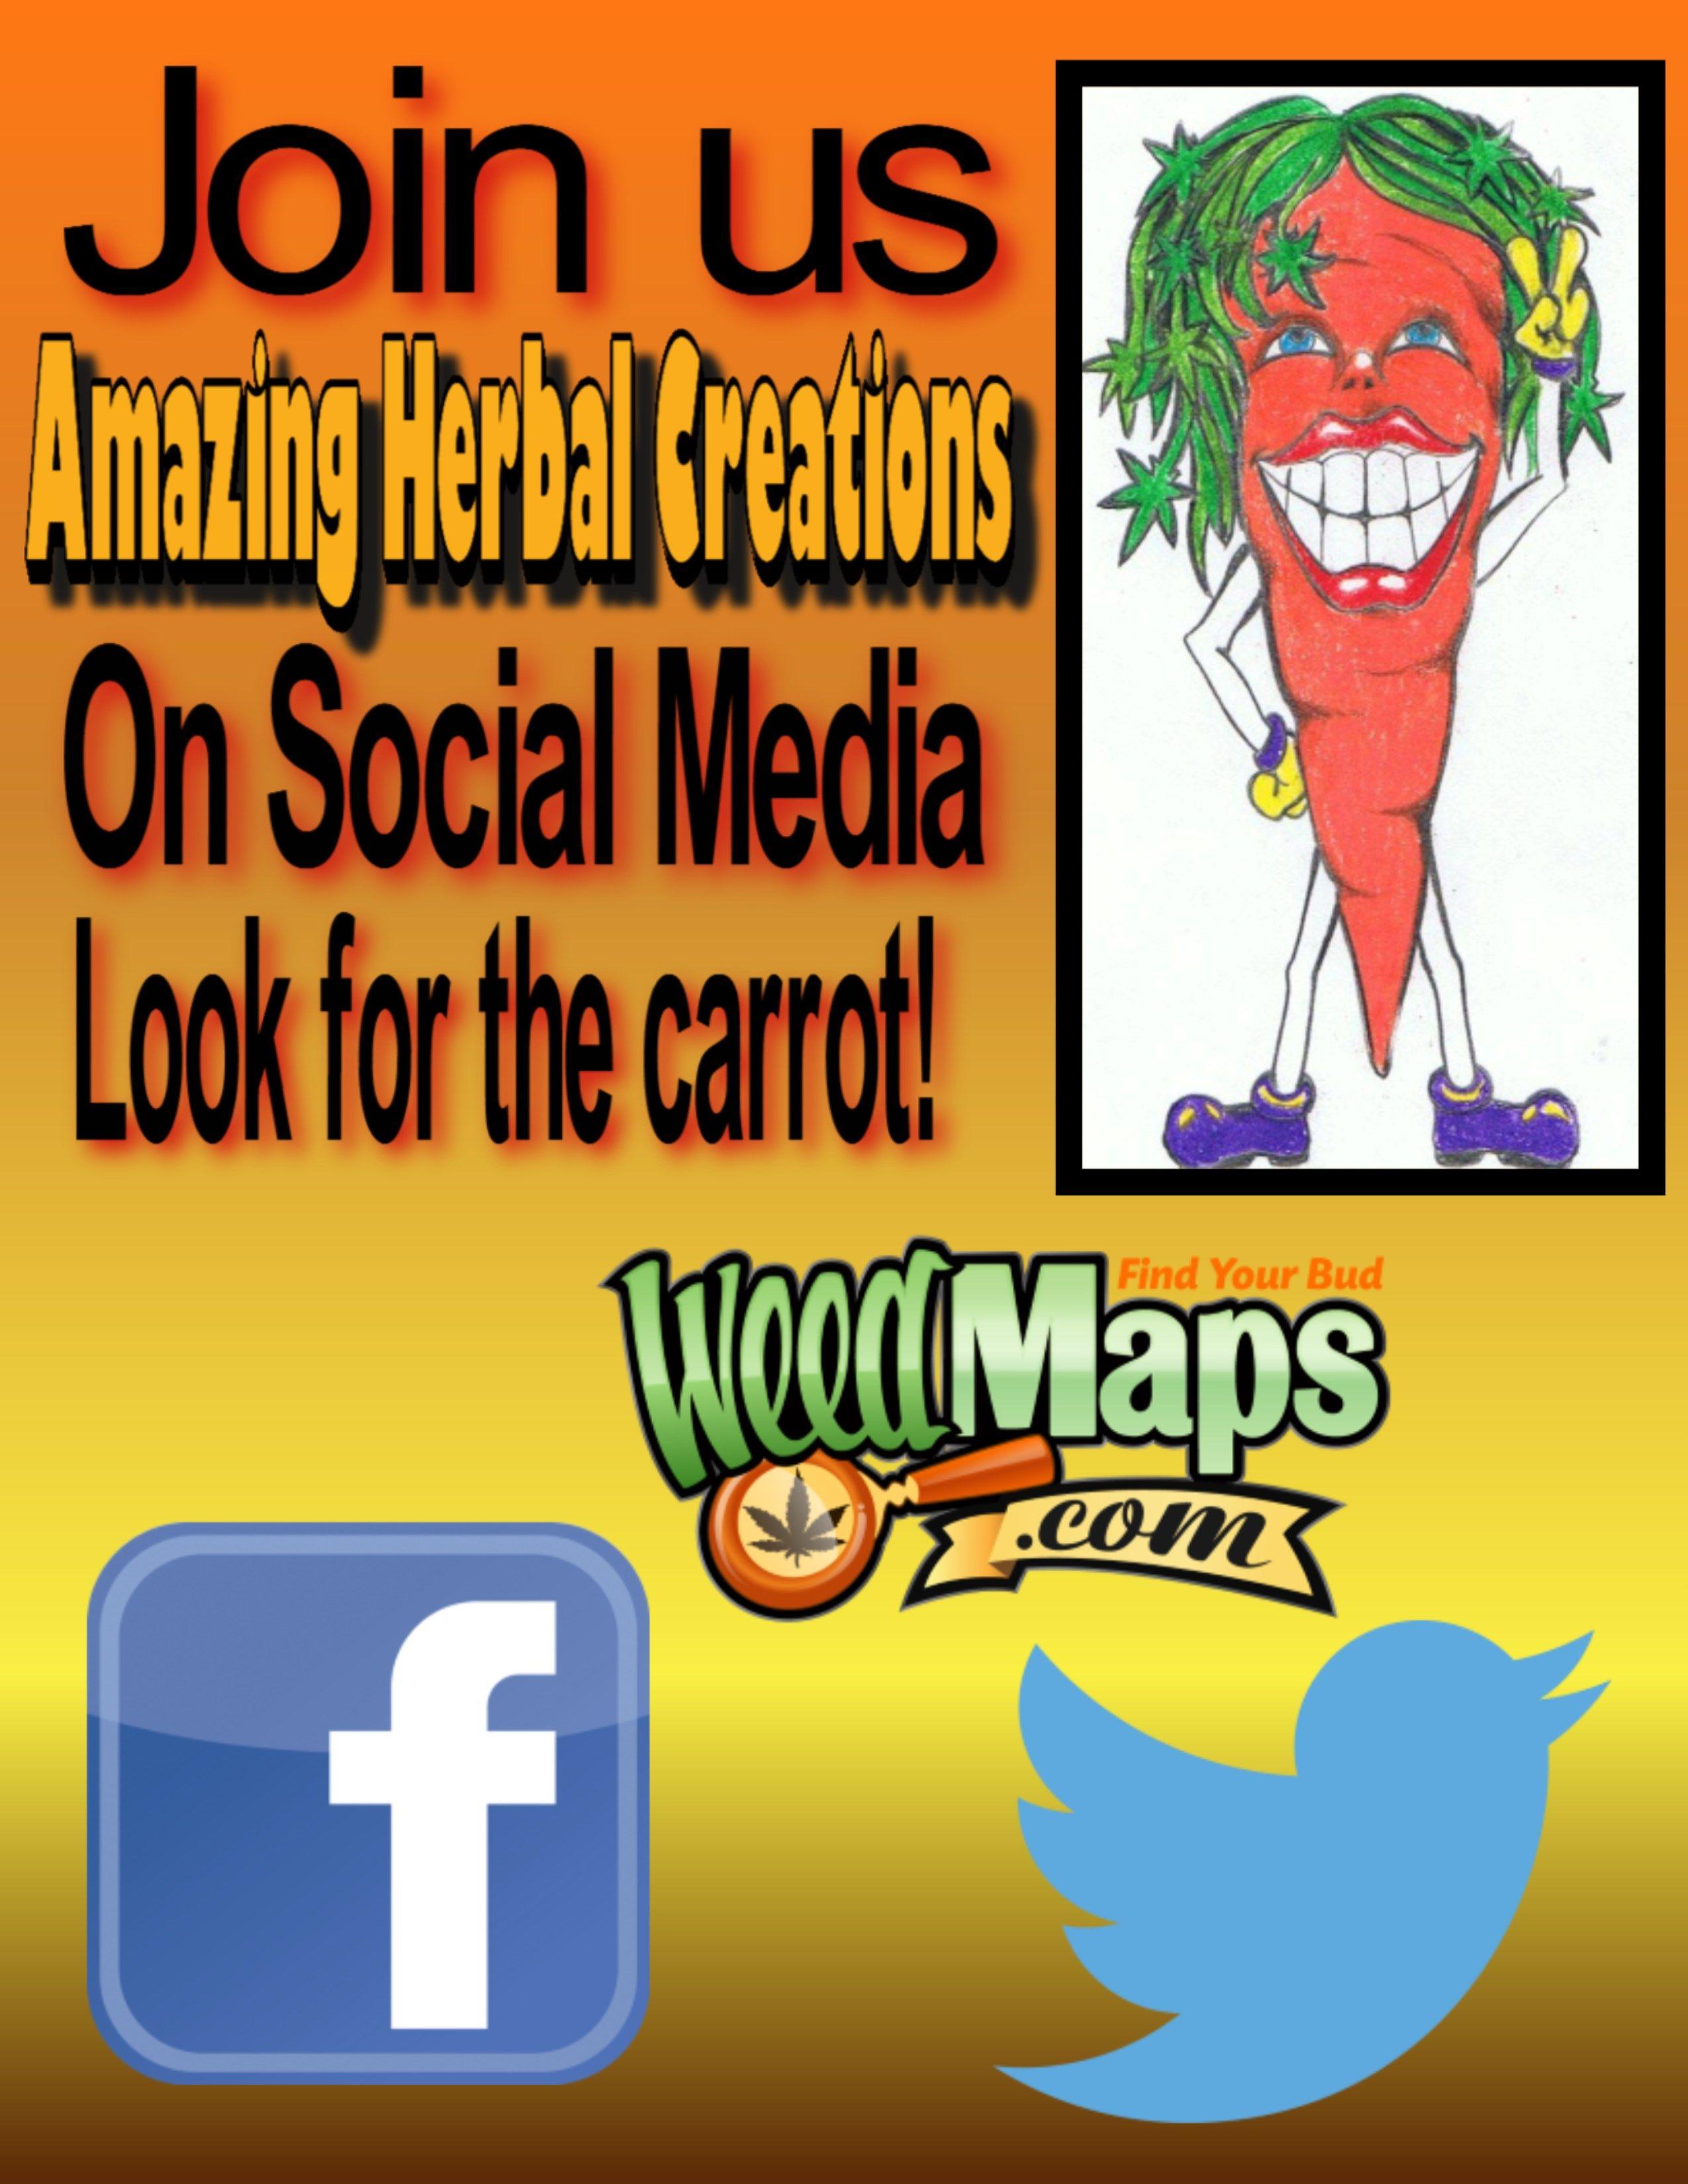 follow us on twitter amazingherbalcr like us on facebook leave us a reviewon weedmaps. follow us on twitter amazingherbalcr like us on facebook leave us